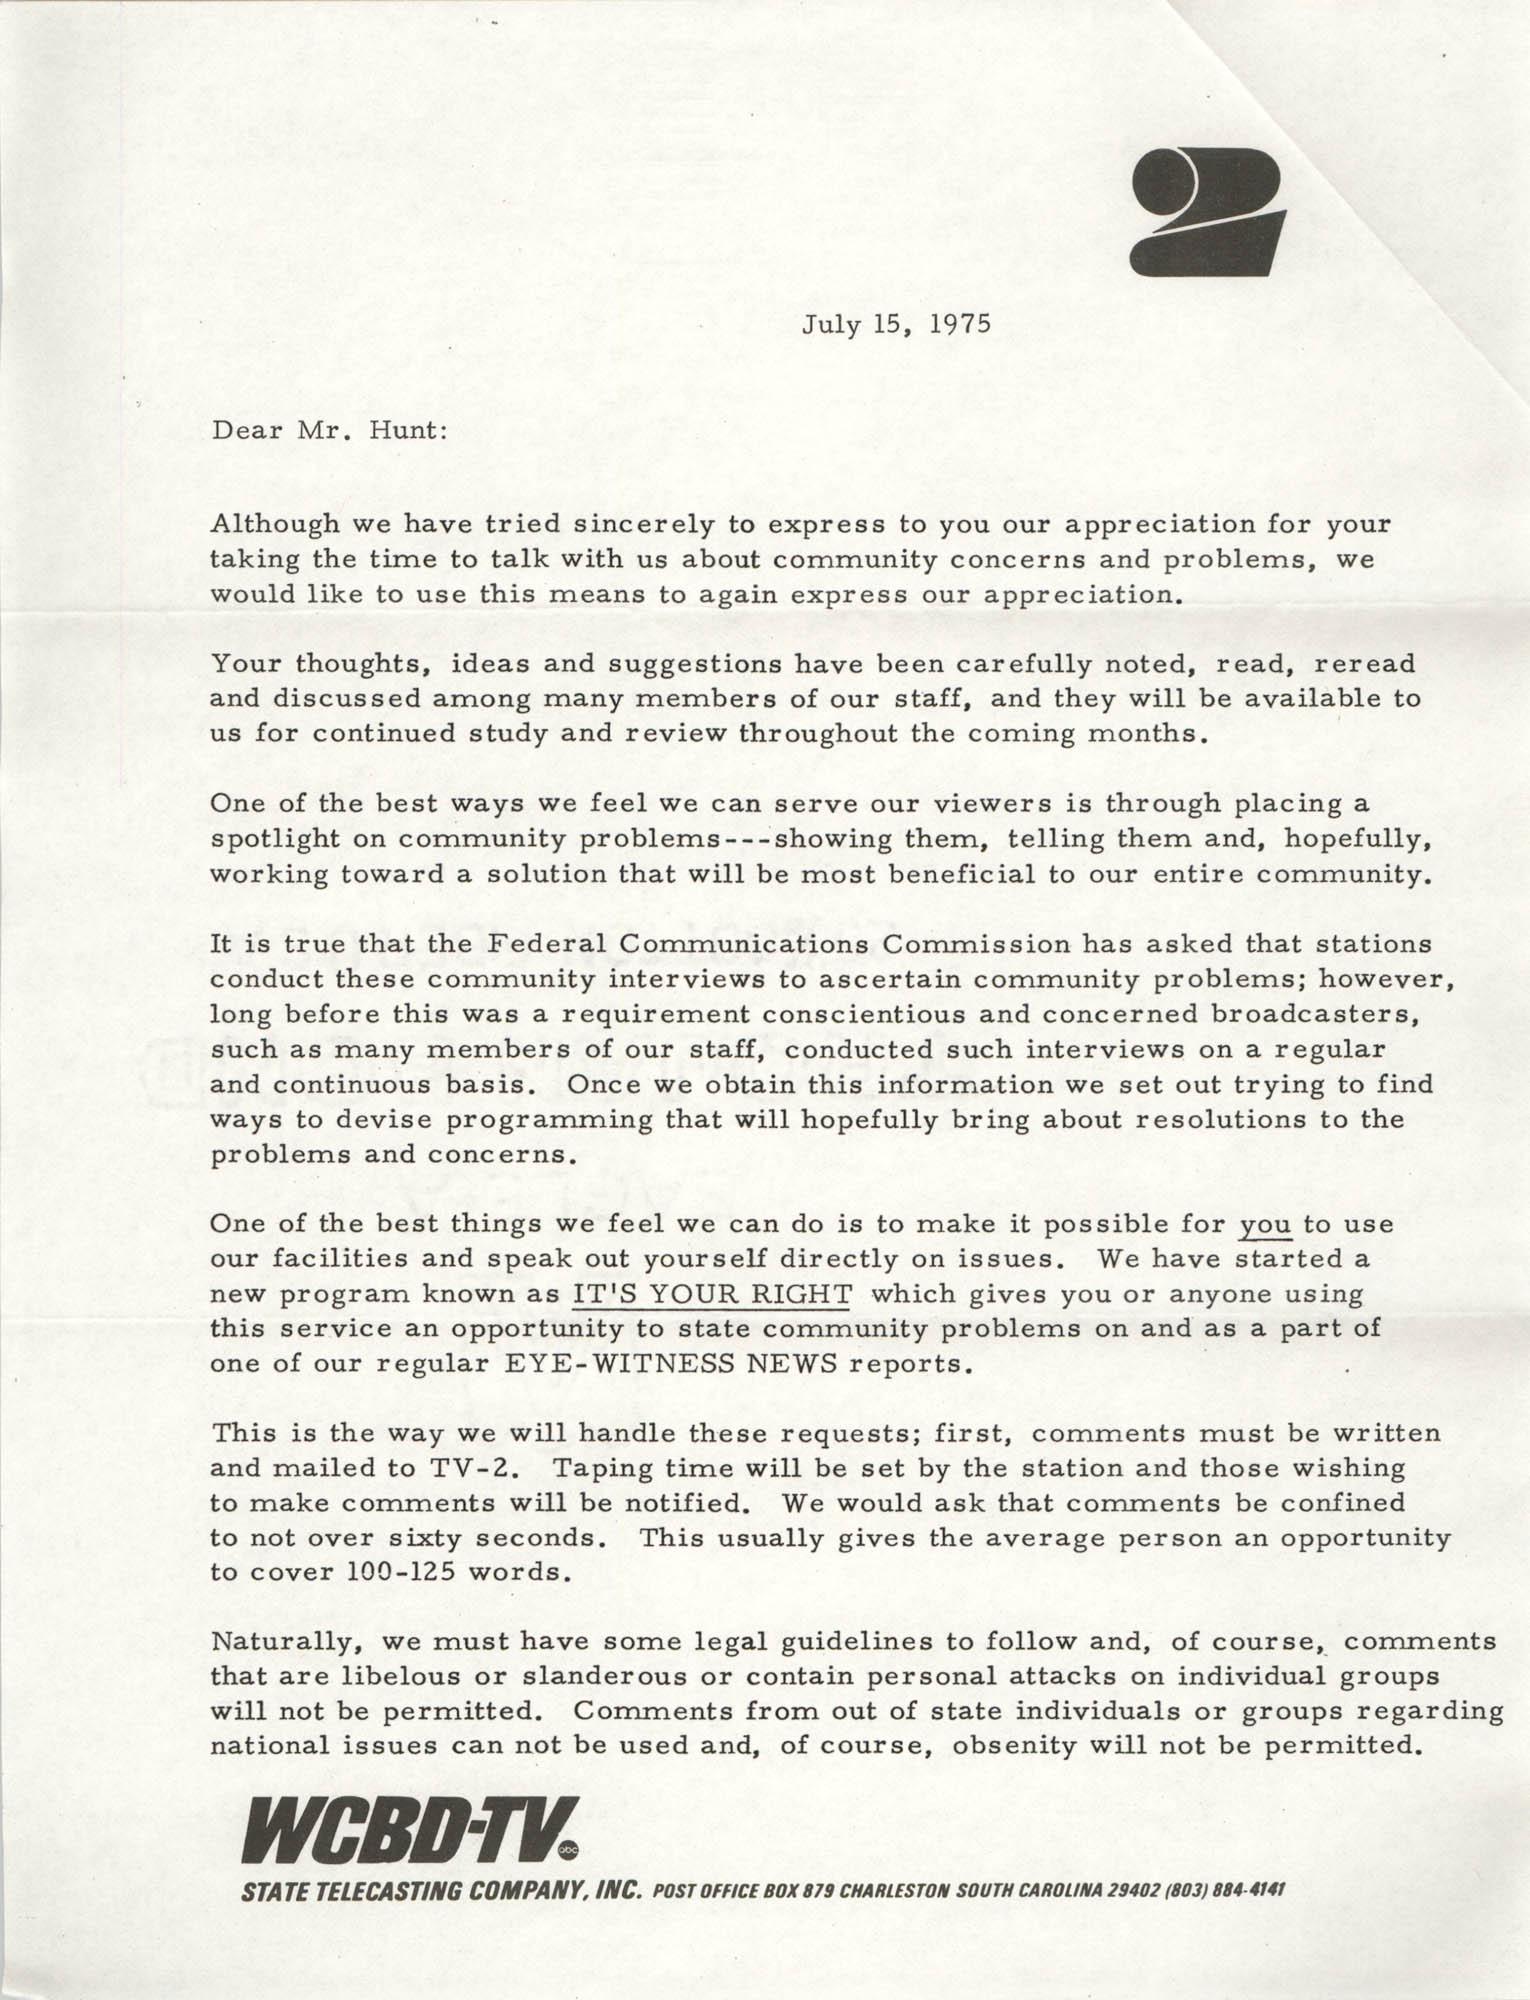 Letter from Carter C. Hardwick, Jr. to Eugene C. Hunt, July 15, 1975